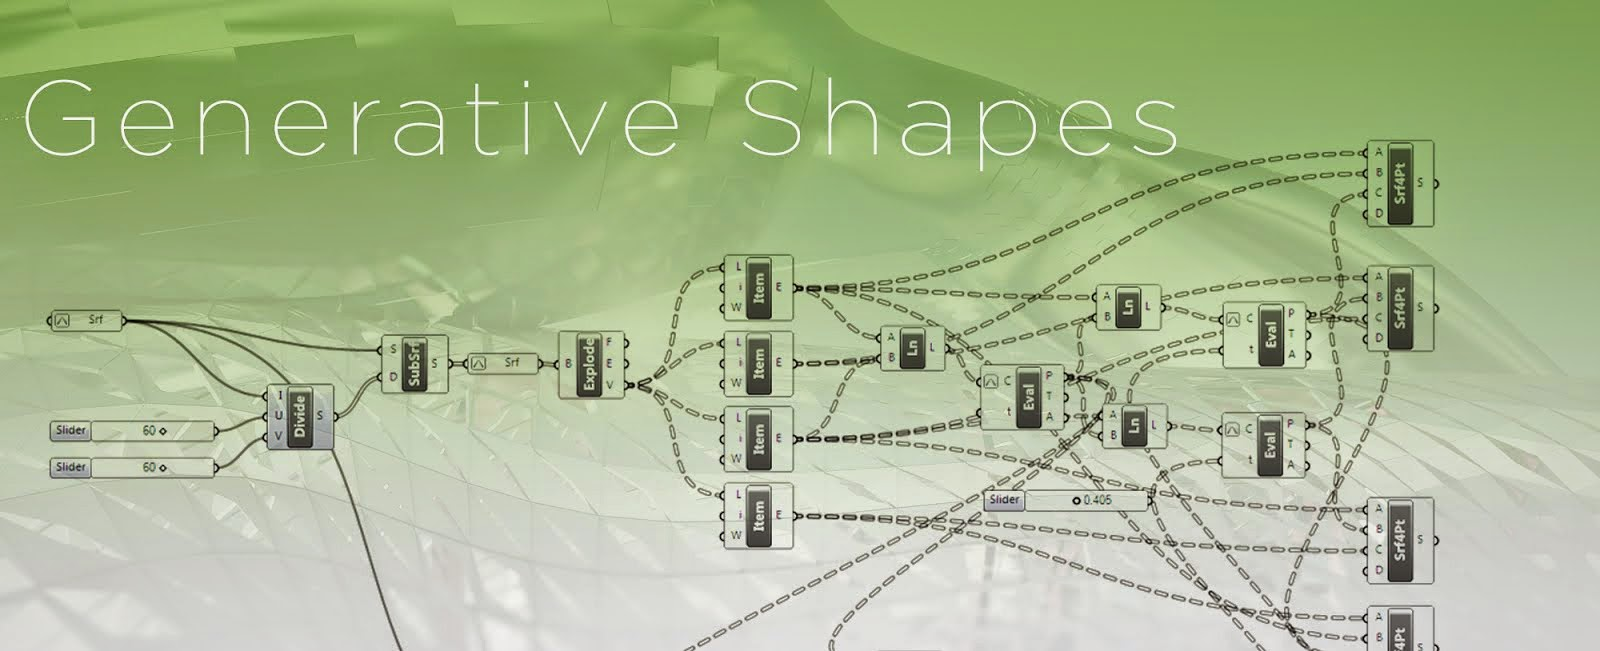 Generative Shapes